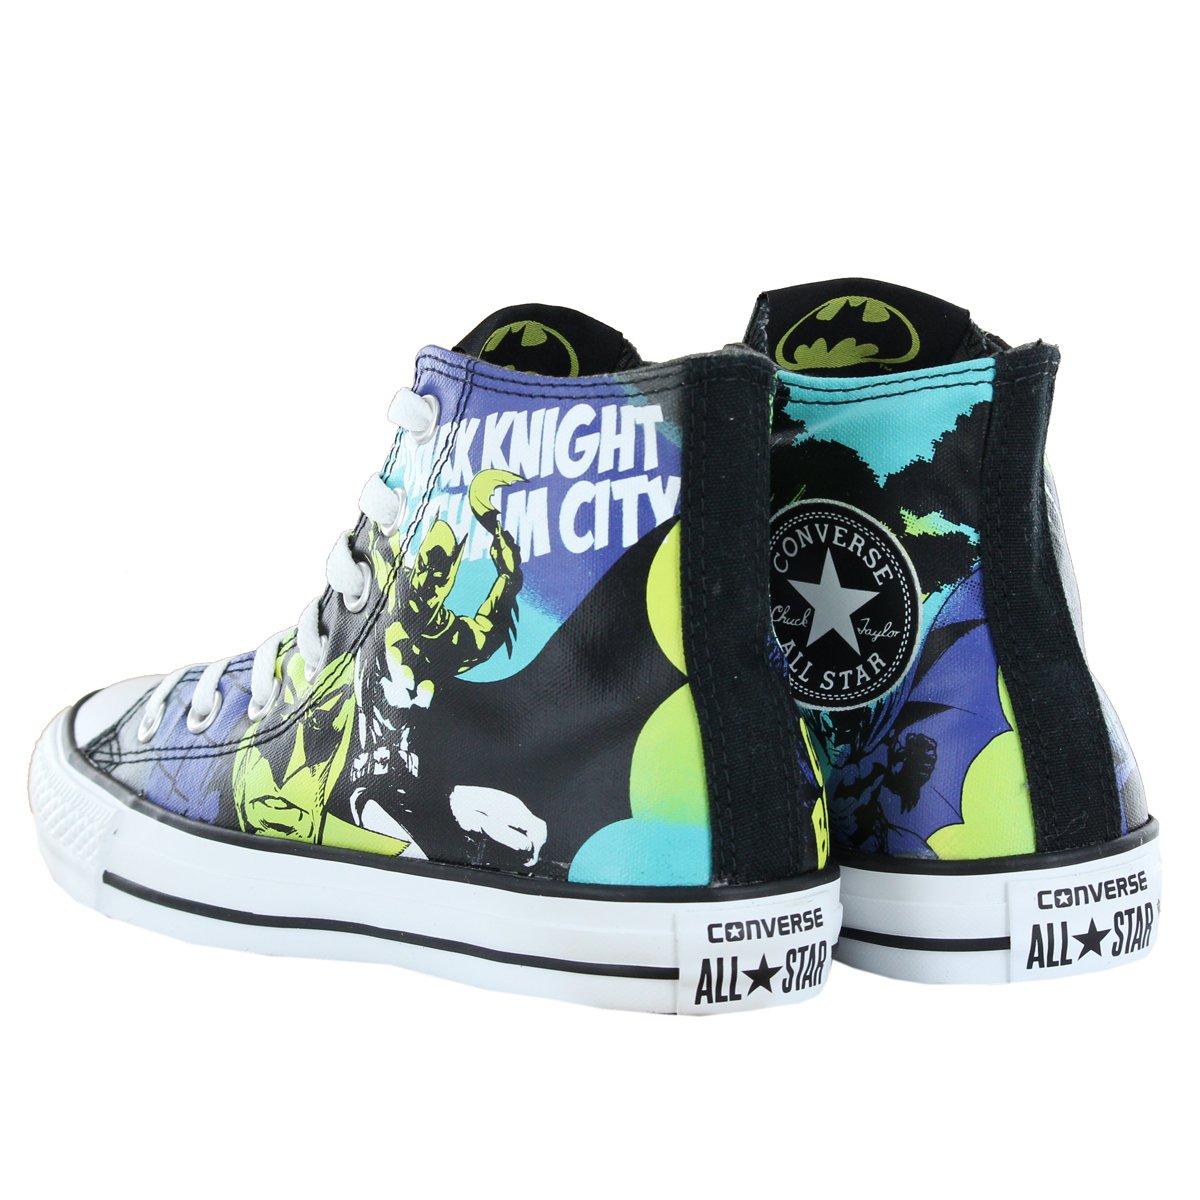 5412b1fa3210 Converse CT DC Batman Hi Black Multi Womens Trainers Size 5.5 UK  Amazon.co. uk  Shoes   Bags